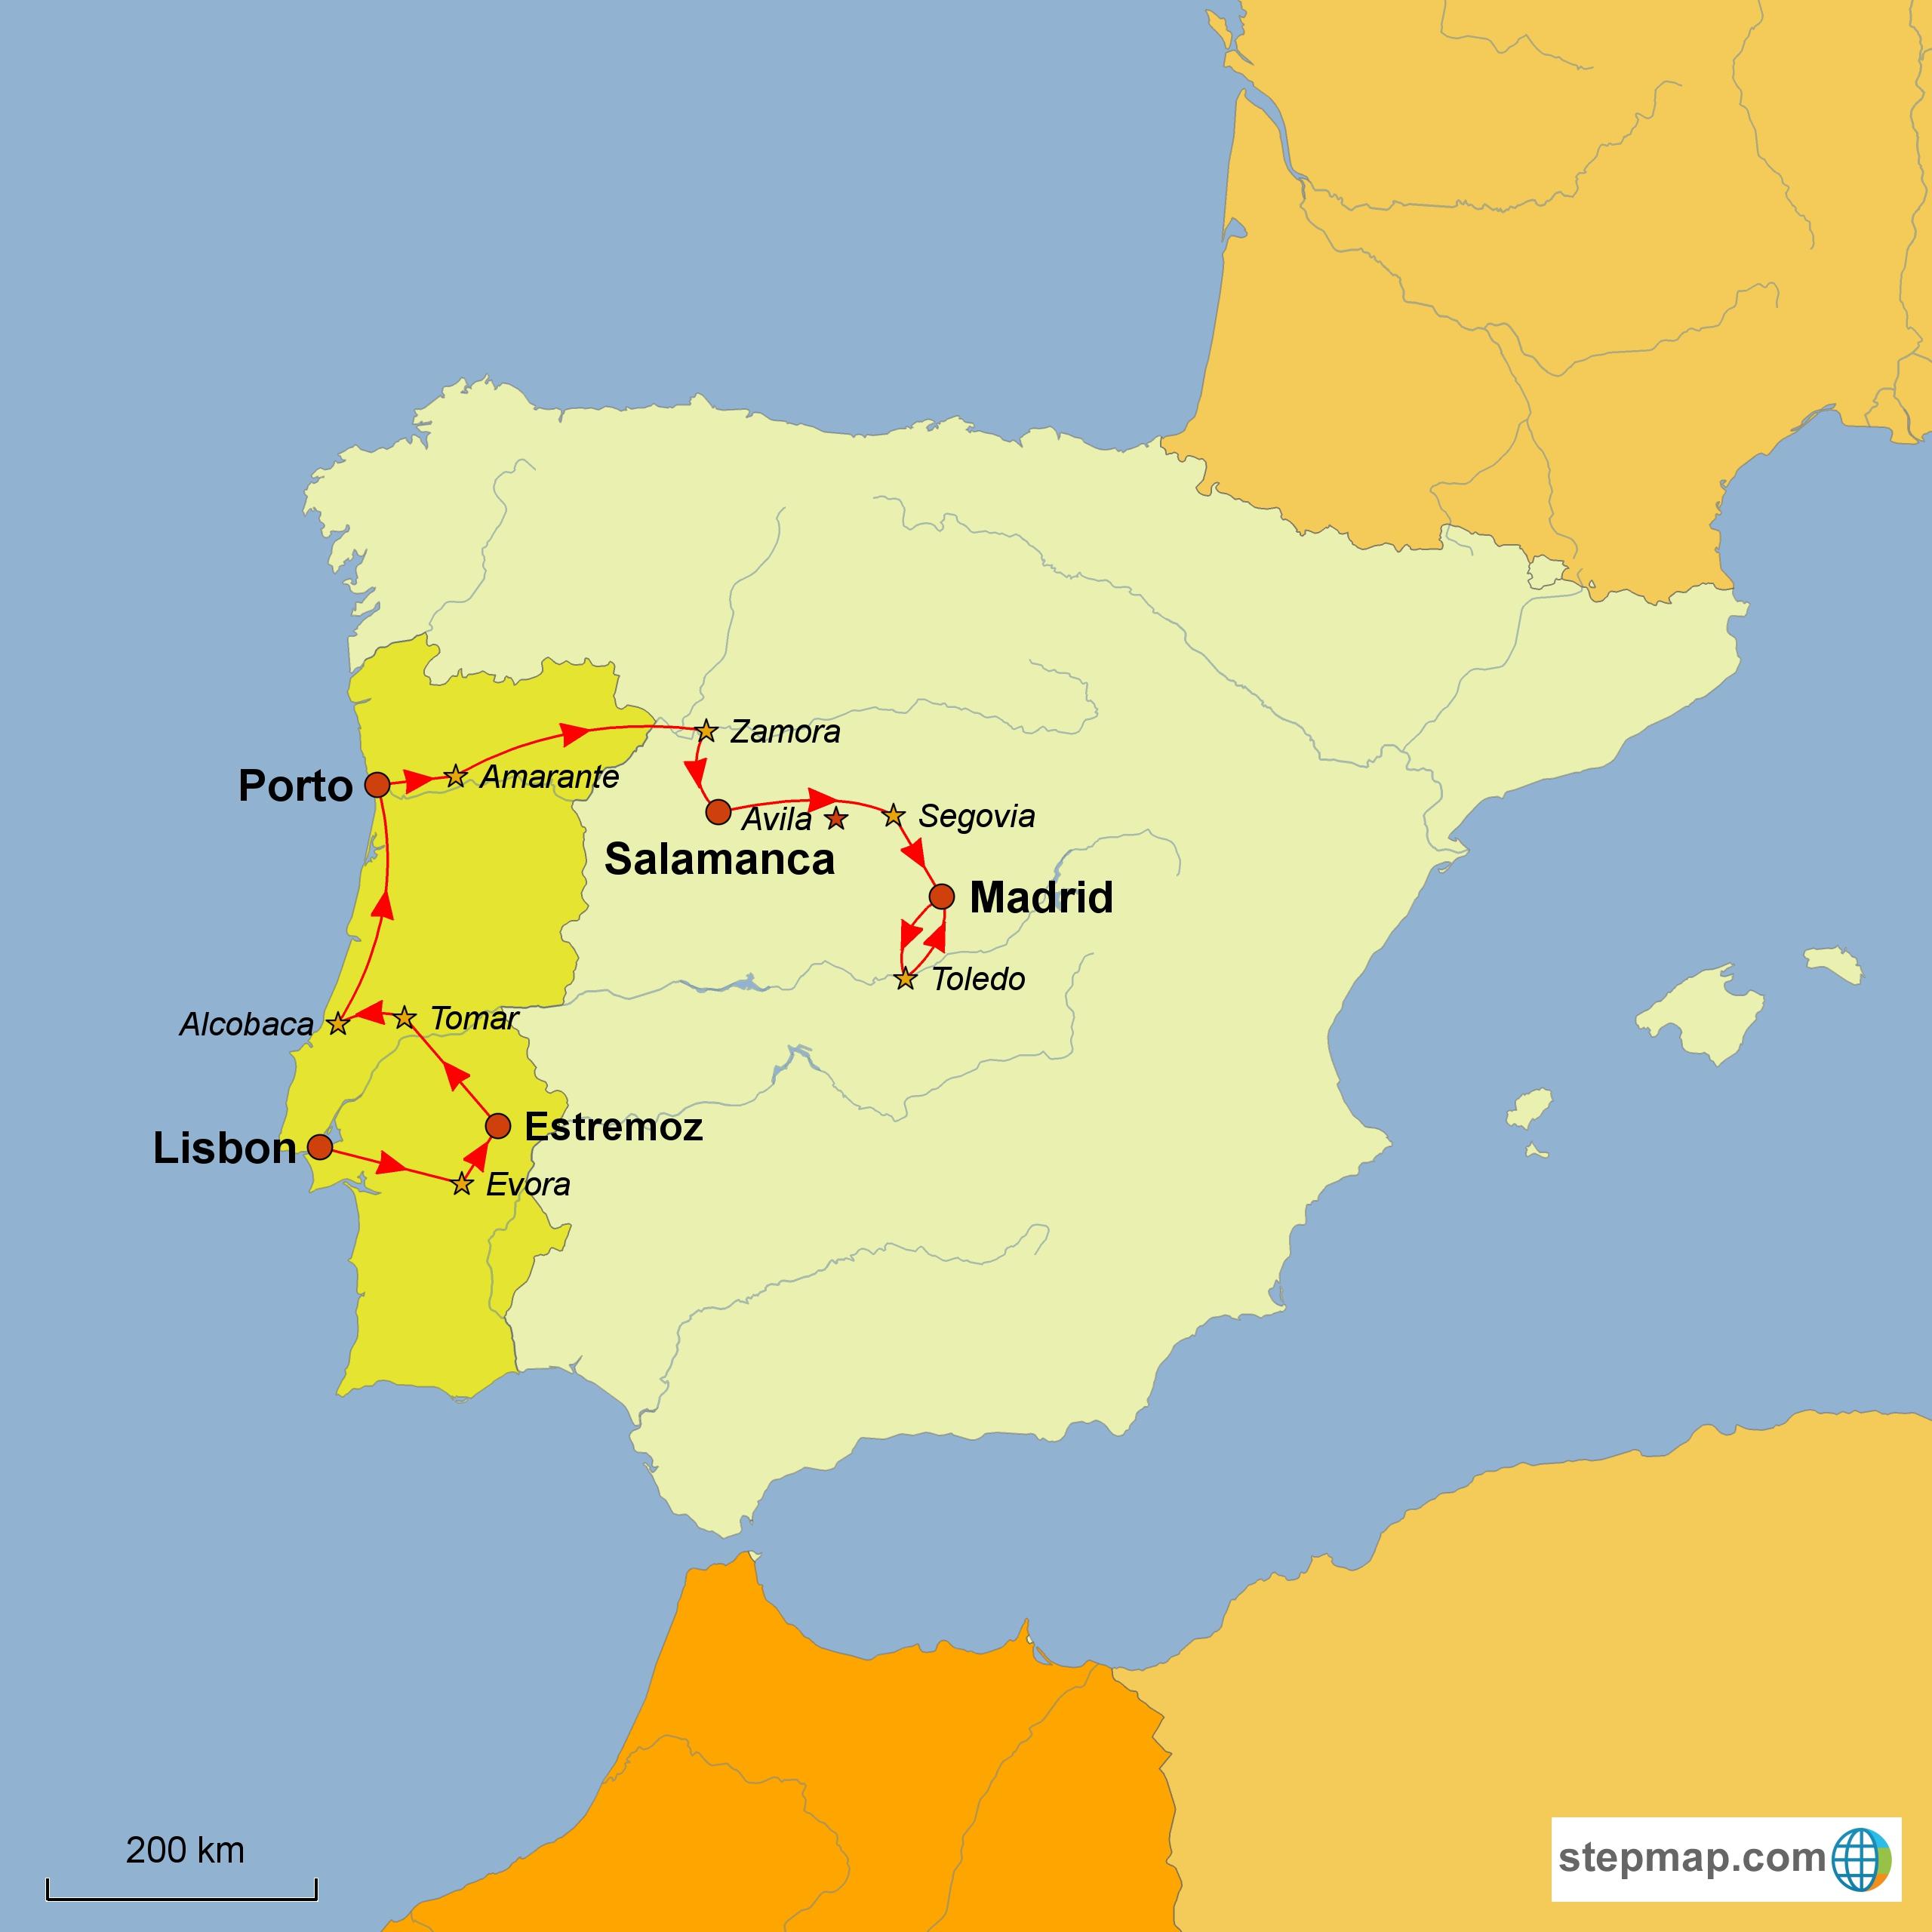 stepmap-karte-con-brio-2016-lisbon-to-madrid-1475687